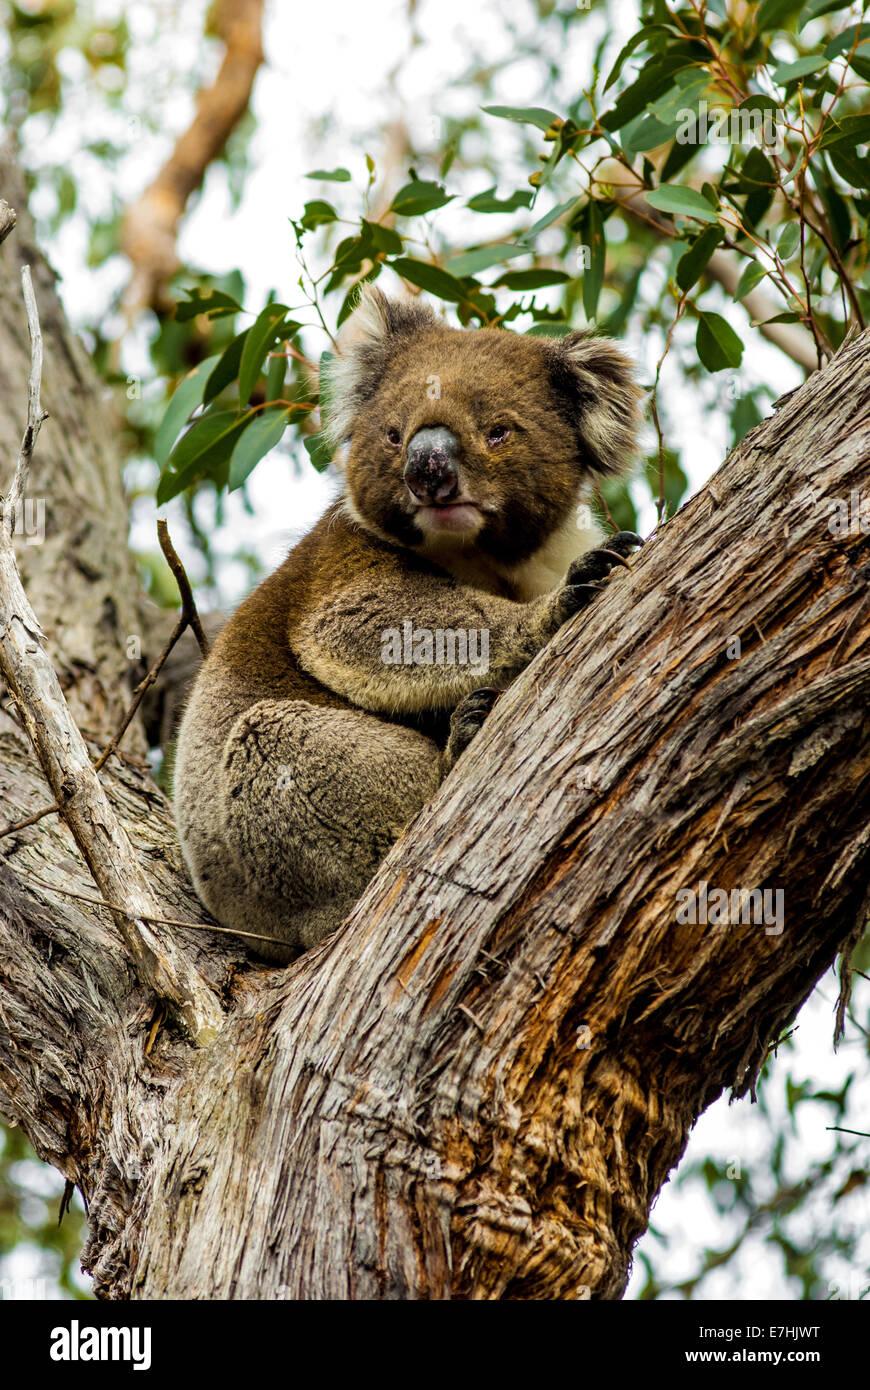 koala on eucalyptus - Stock Image